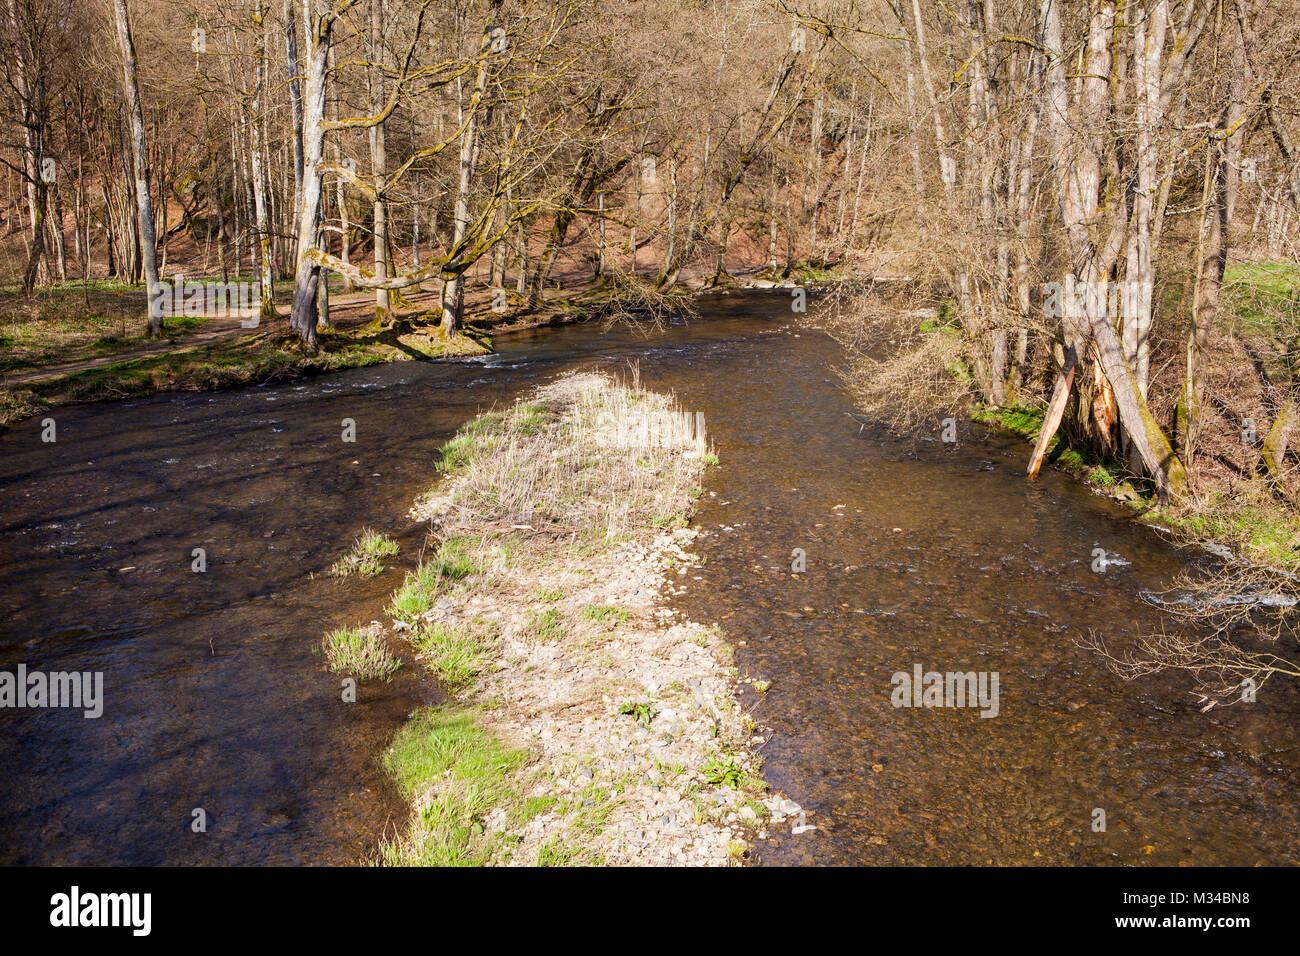 Old bridge near Streithausen, Nister river, Westerwald district, Rhineland-Palatinate, Germany, Europe - Stock Image